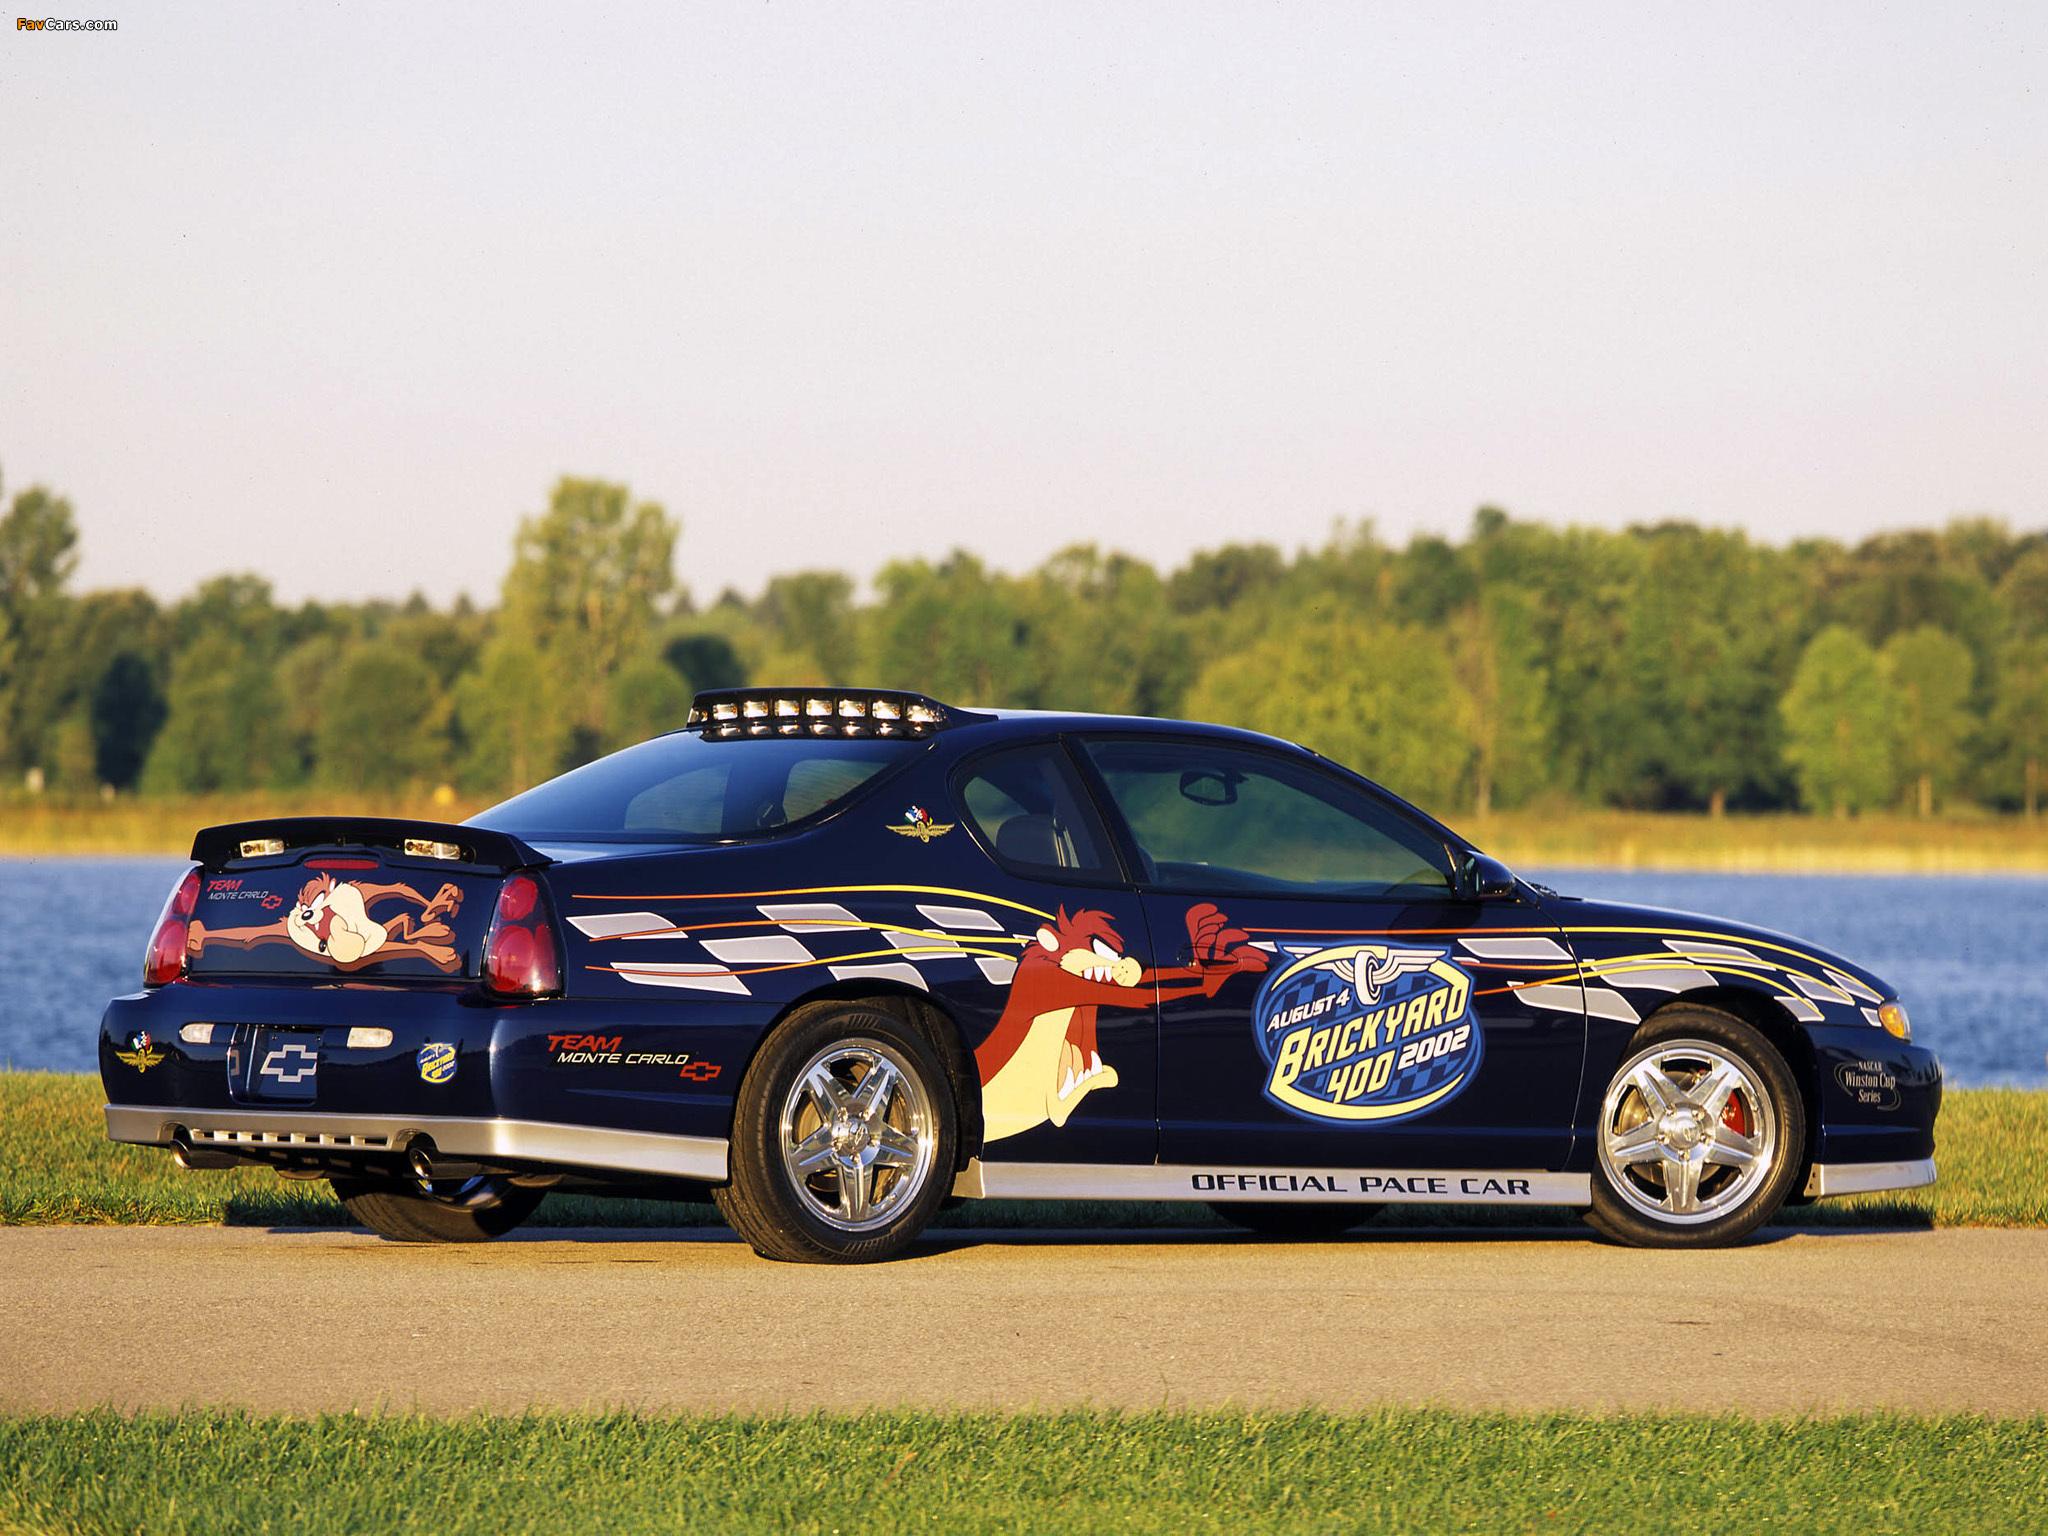 Chevrolet Monte Carlo Brickyard 400 Pace Car 2002 wallpapers (2048 x 1536)